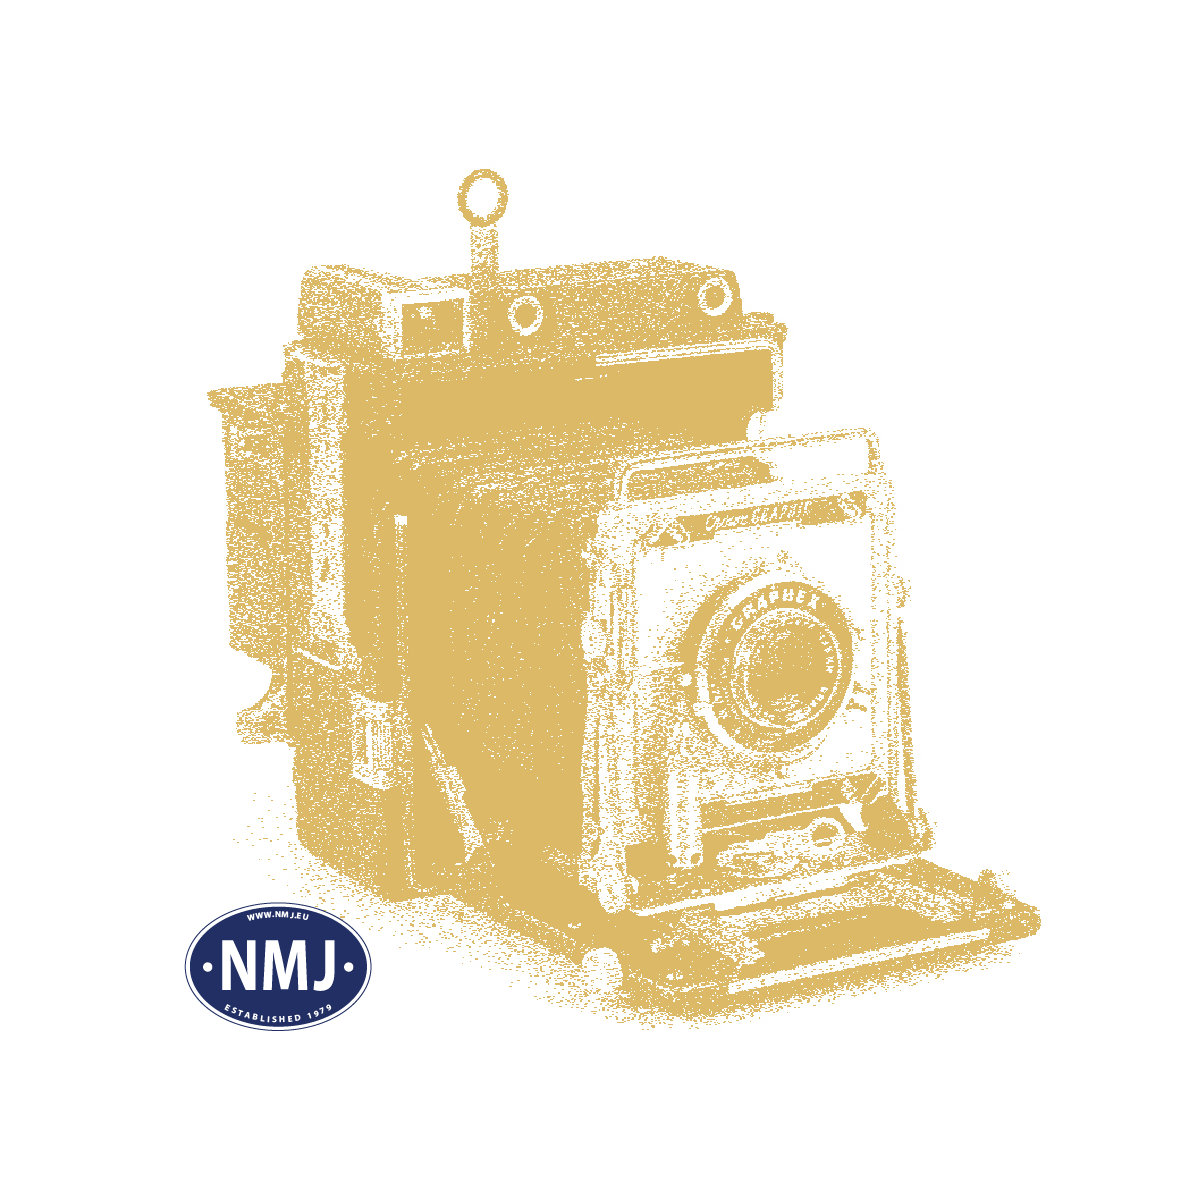 NMJ0T3-4 - NMJ Superline NSB T3 17002, 0-Scala